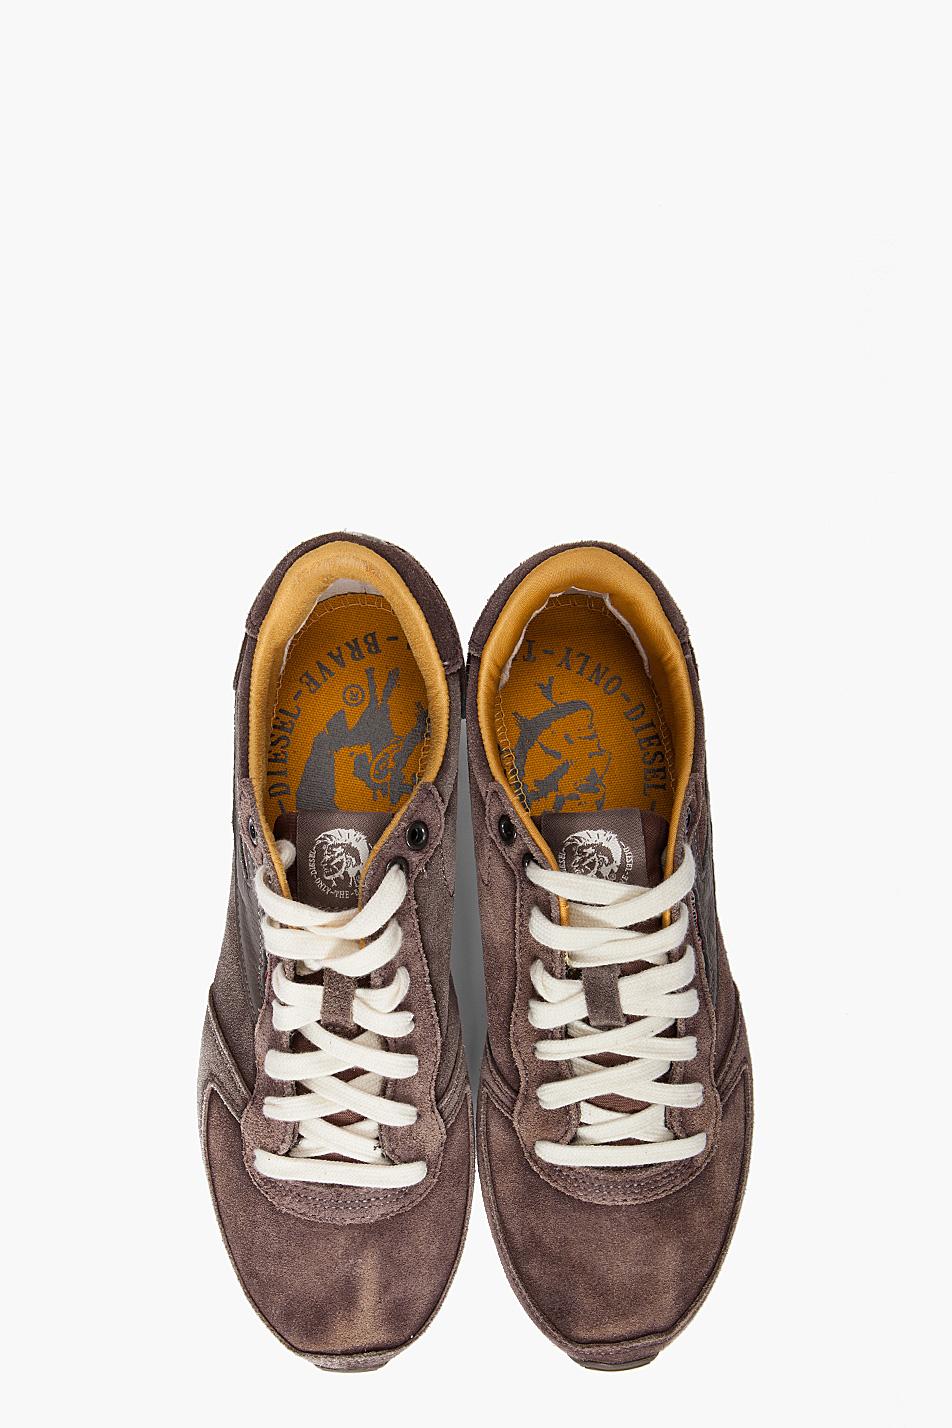 Diesel Pass On Sneakers In Grey Gray For Men Lyst